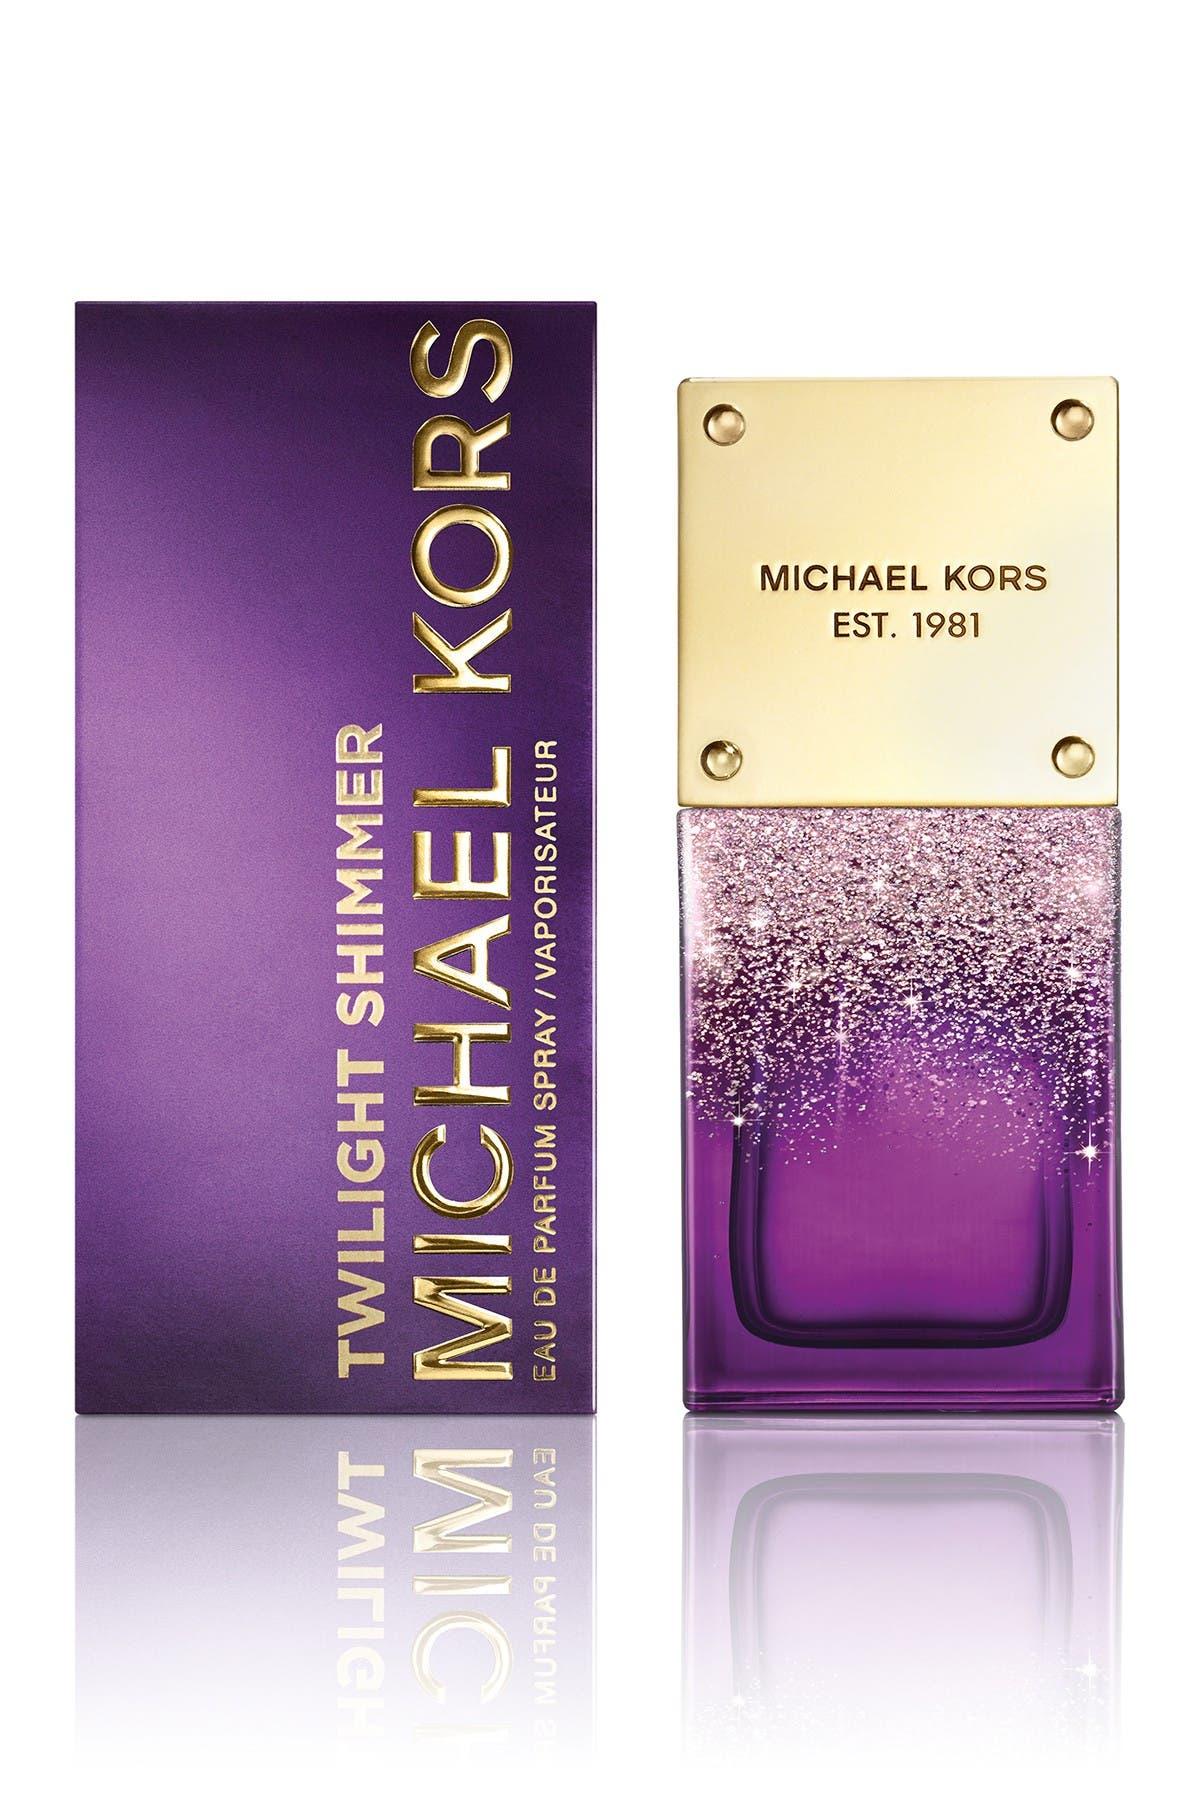 Image of Michael Kors Twilight Shimmer Eau de Parfume Spray - 30ml/ 1.0 fl oz